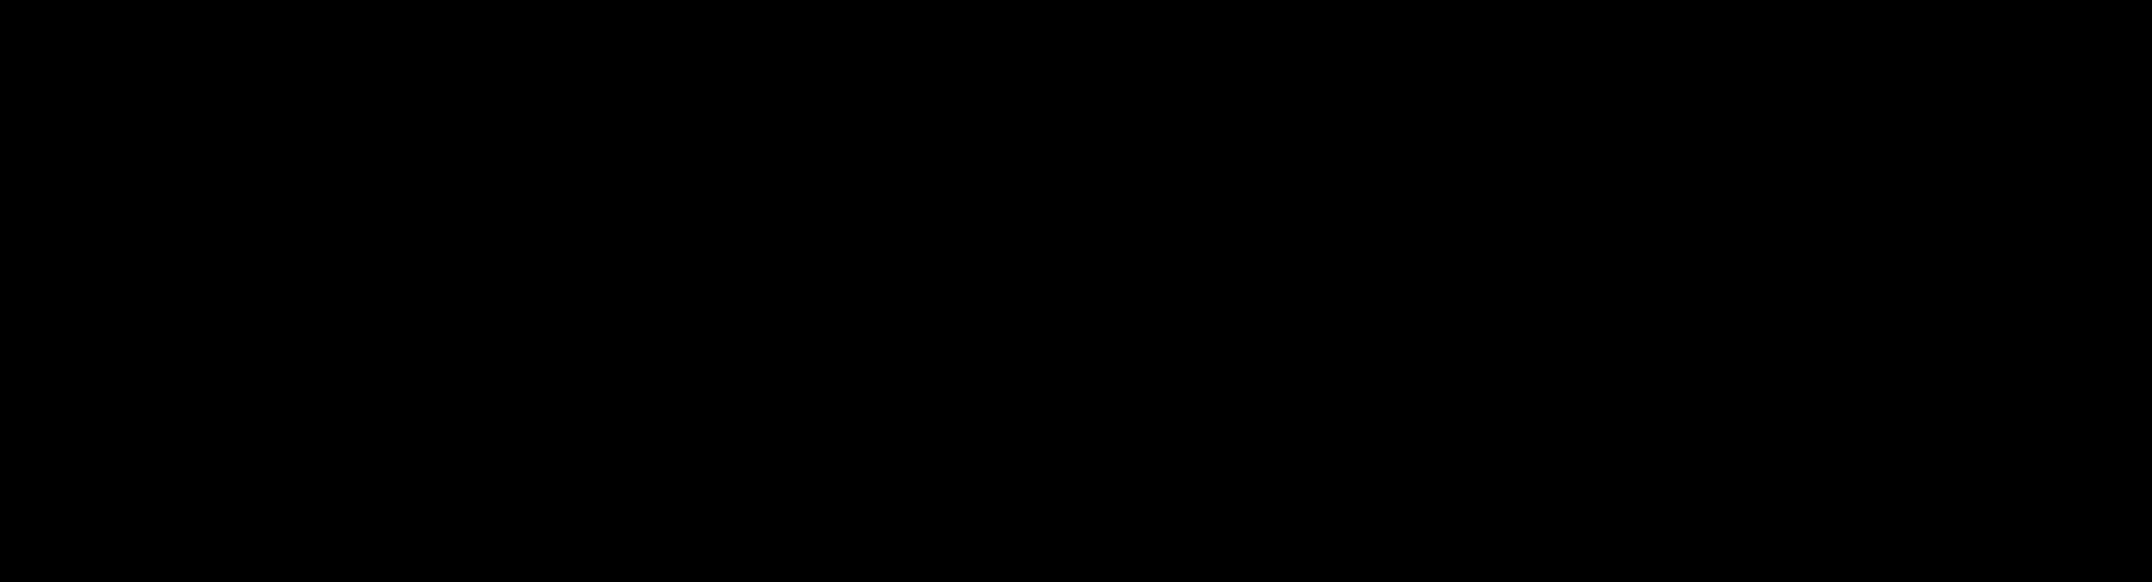 Melodie Girard Aesthetics logo